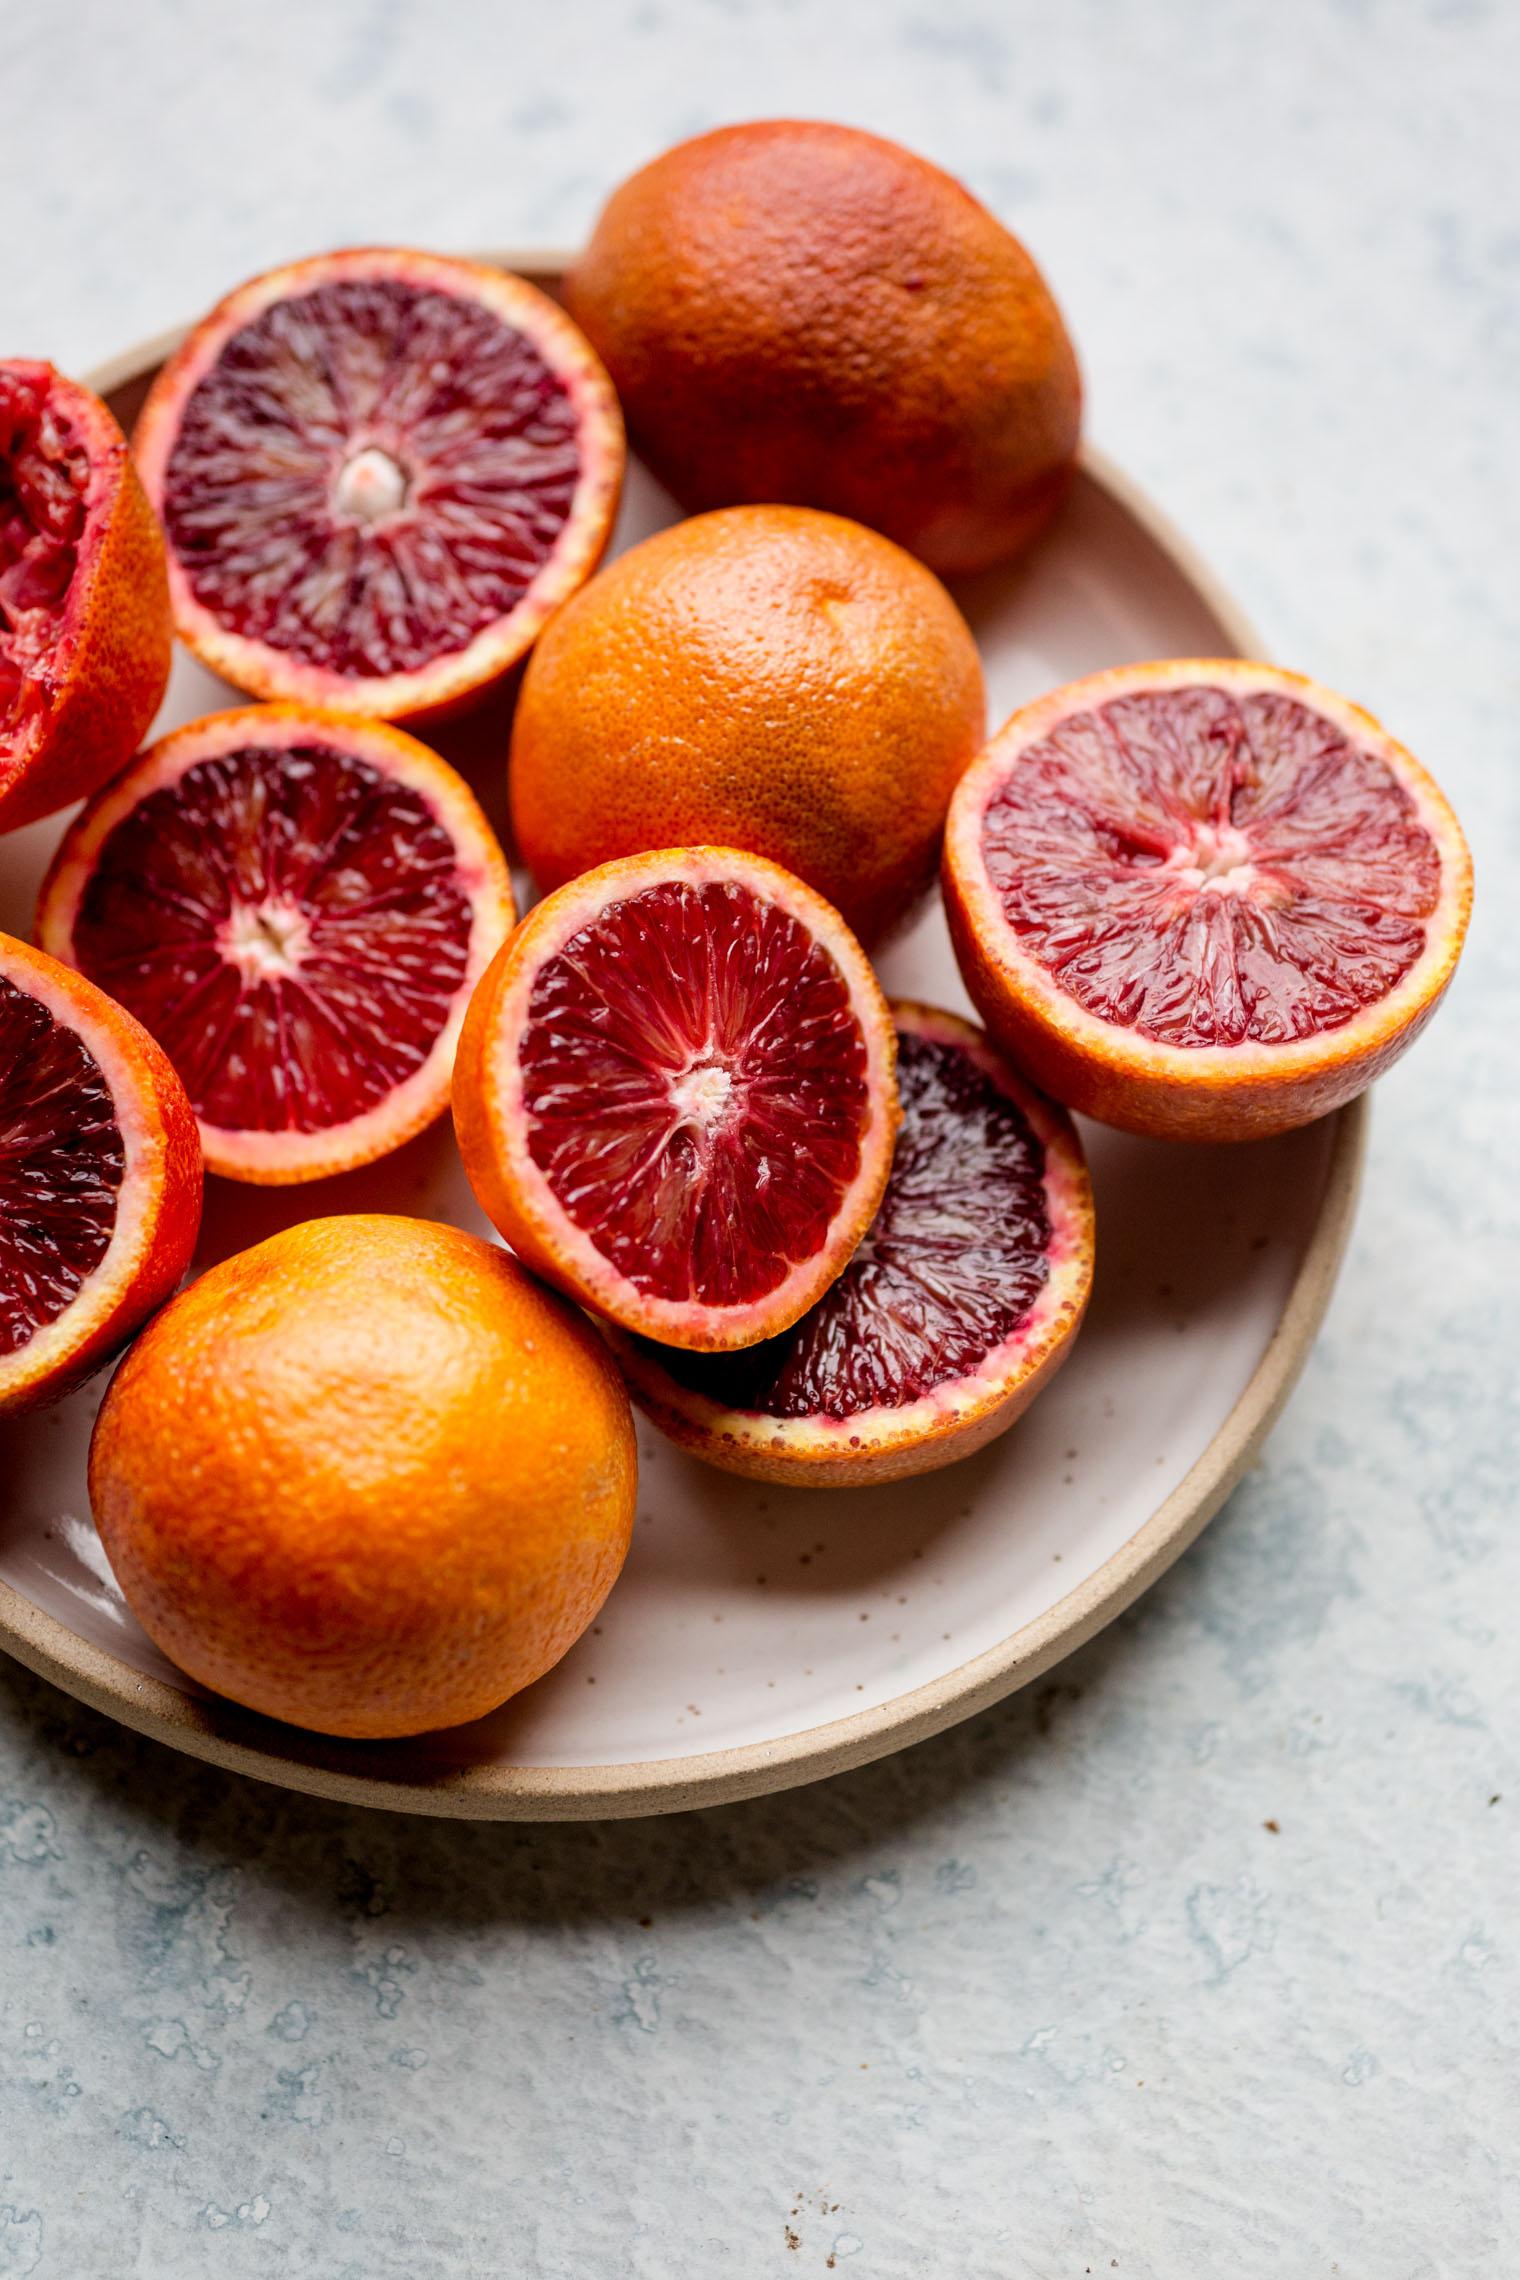 Blood Orange Sorbet with Red Wine Hot Fudge